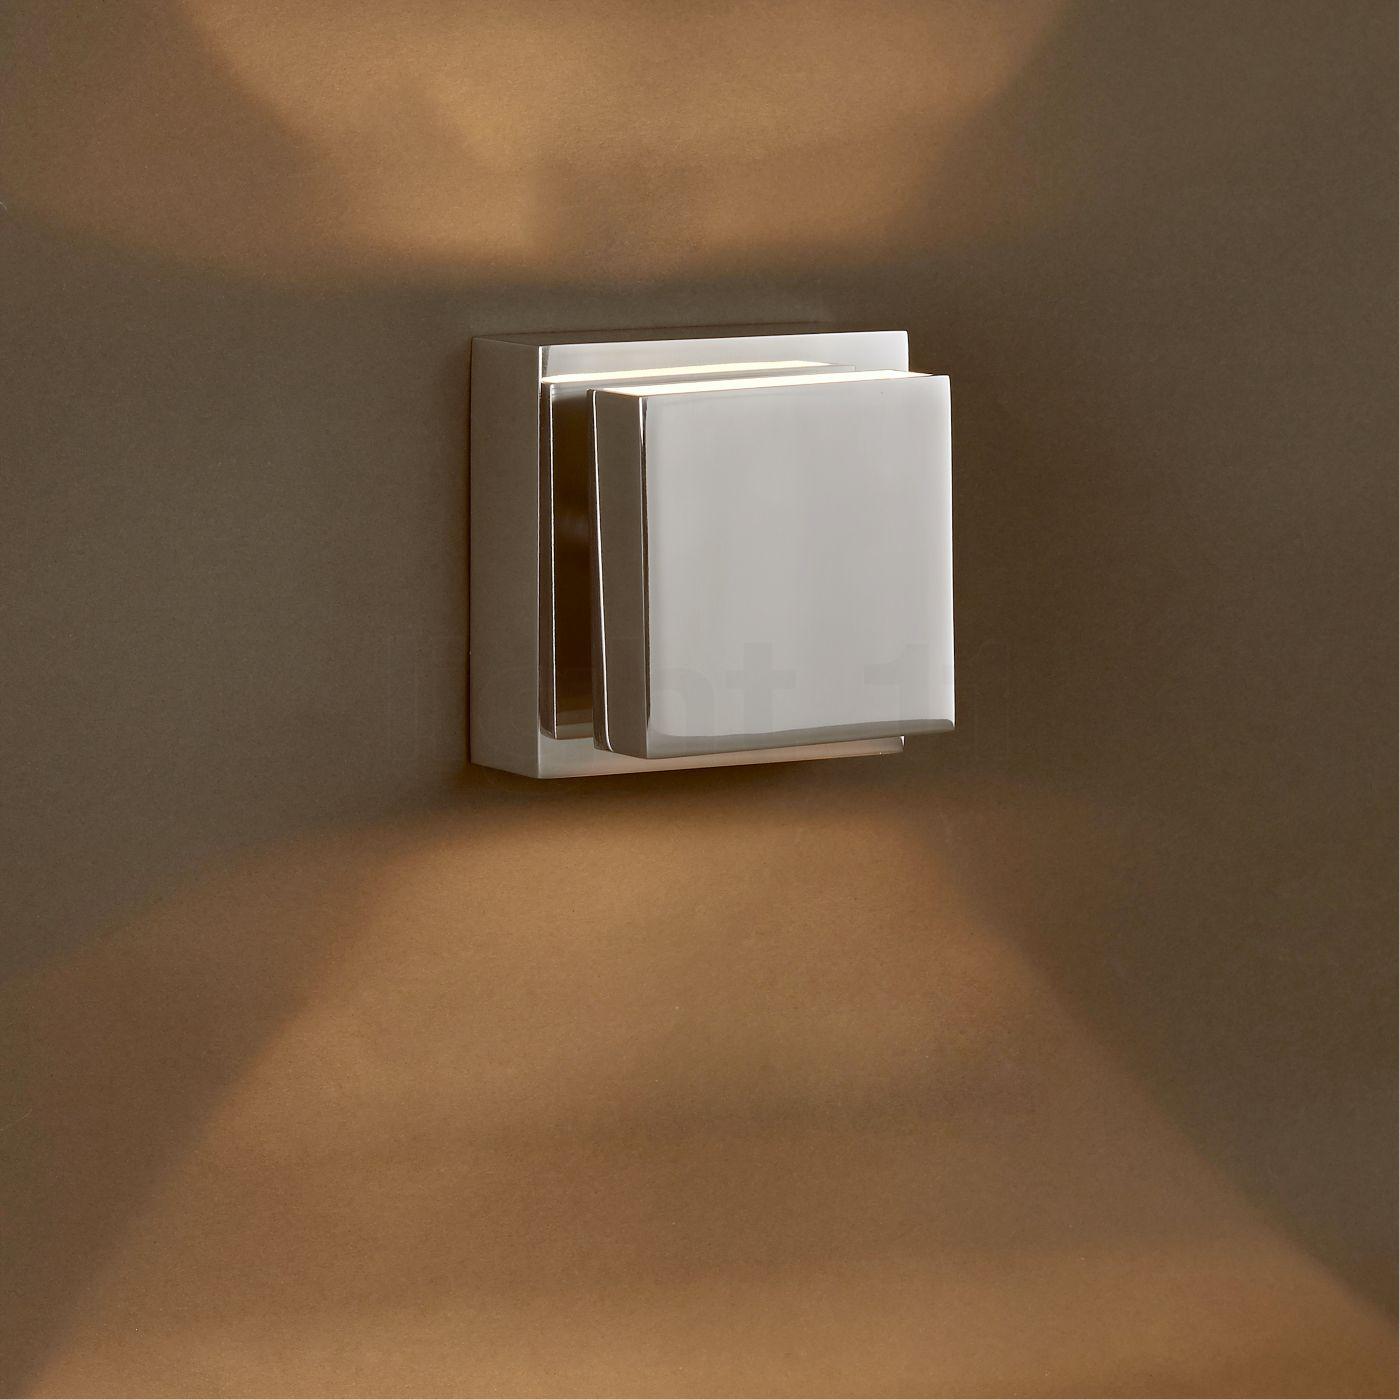 Bruck_Scobo_Up_Down_W--2000013700421lw_lw_001_003 Faszinierend Up Down Lampe Dekorationen